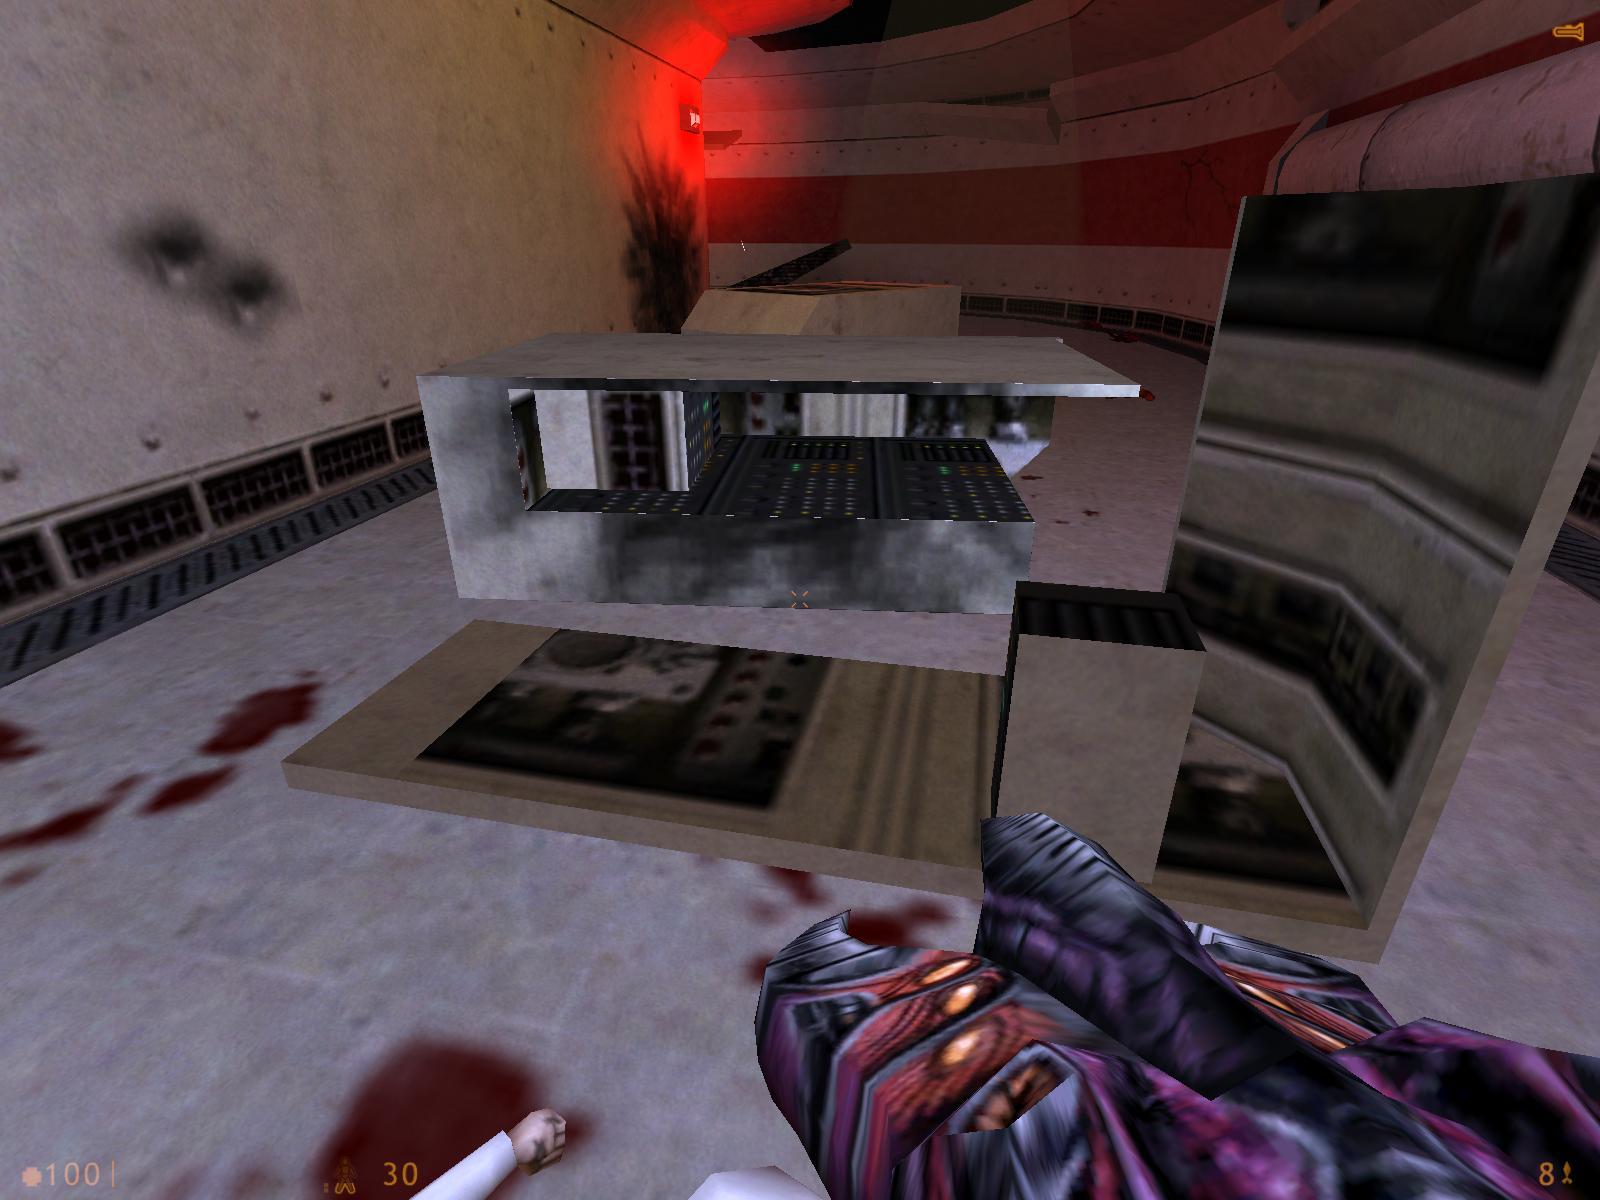 X9py0NTu_hk.jpg - Half-Life